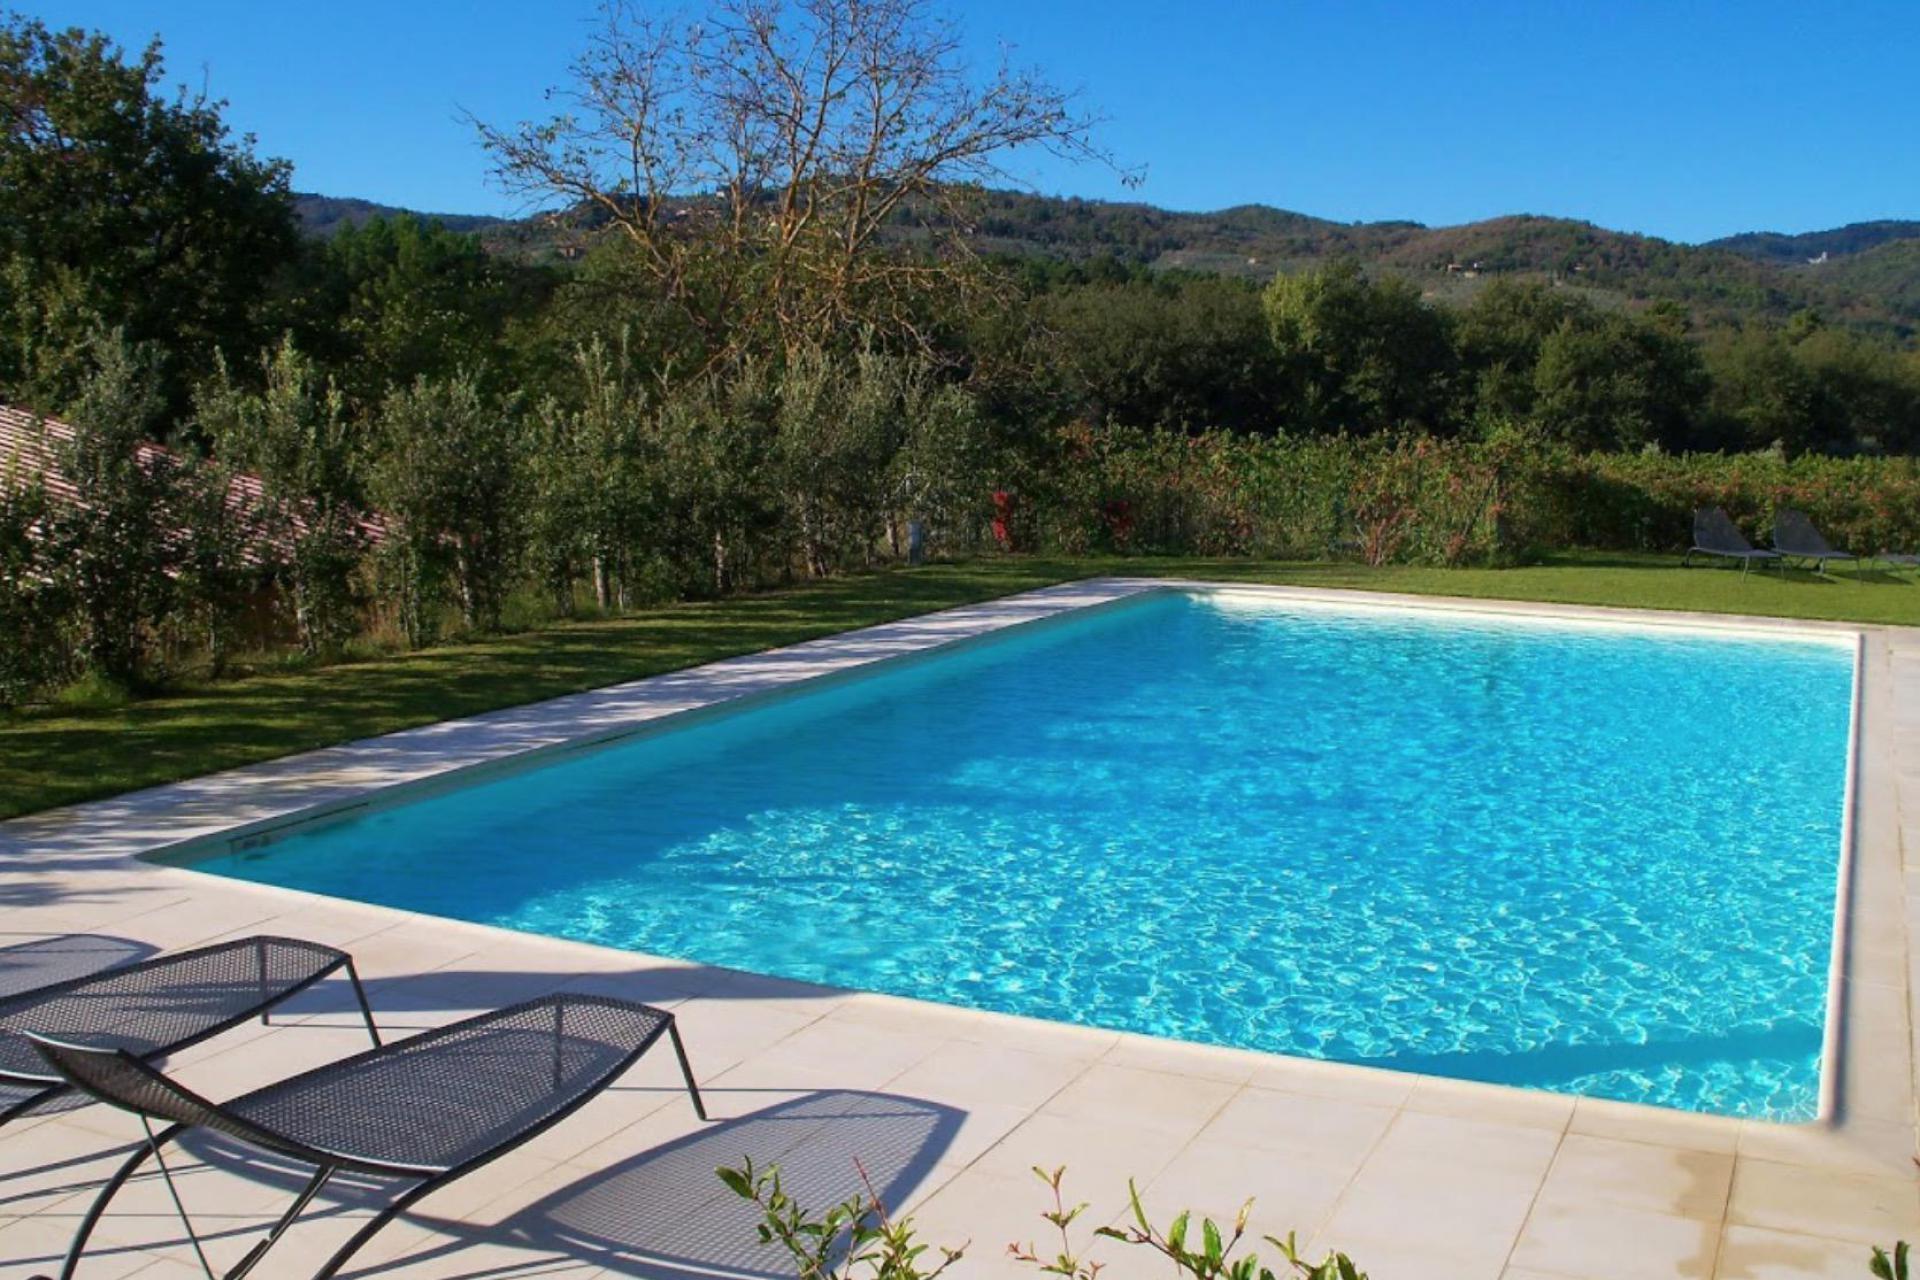 Agriturismo Tuscany Beautiful wine farm in the Chianti hills, Tuscany